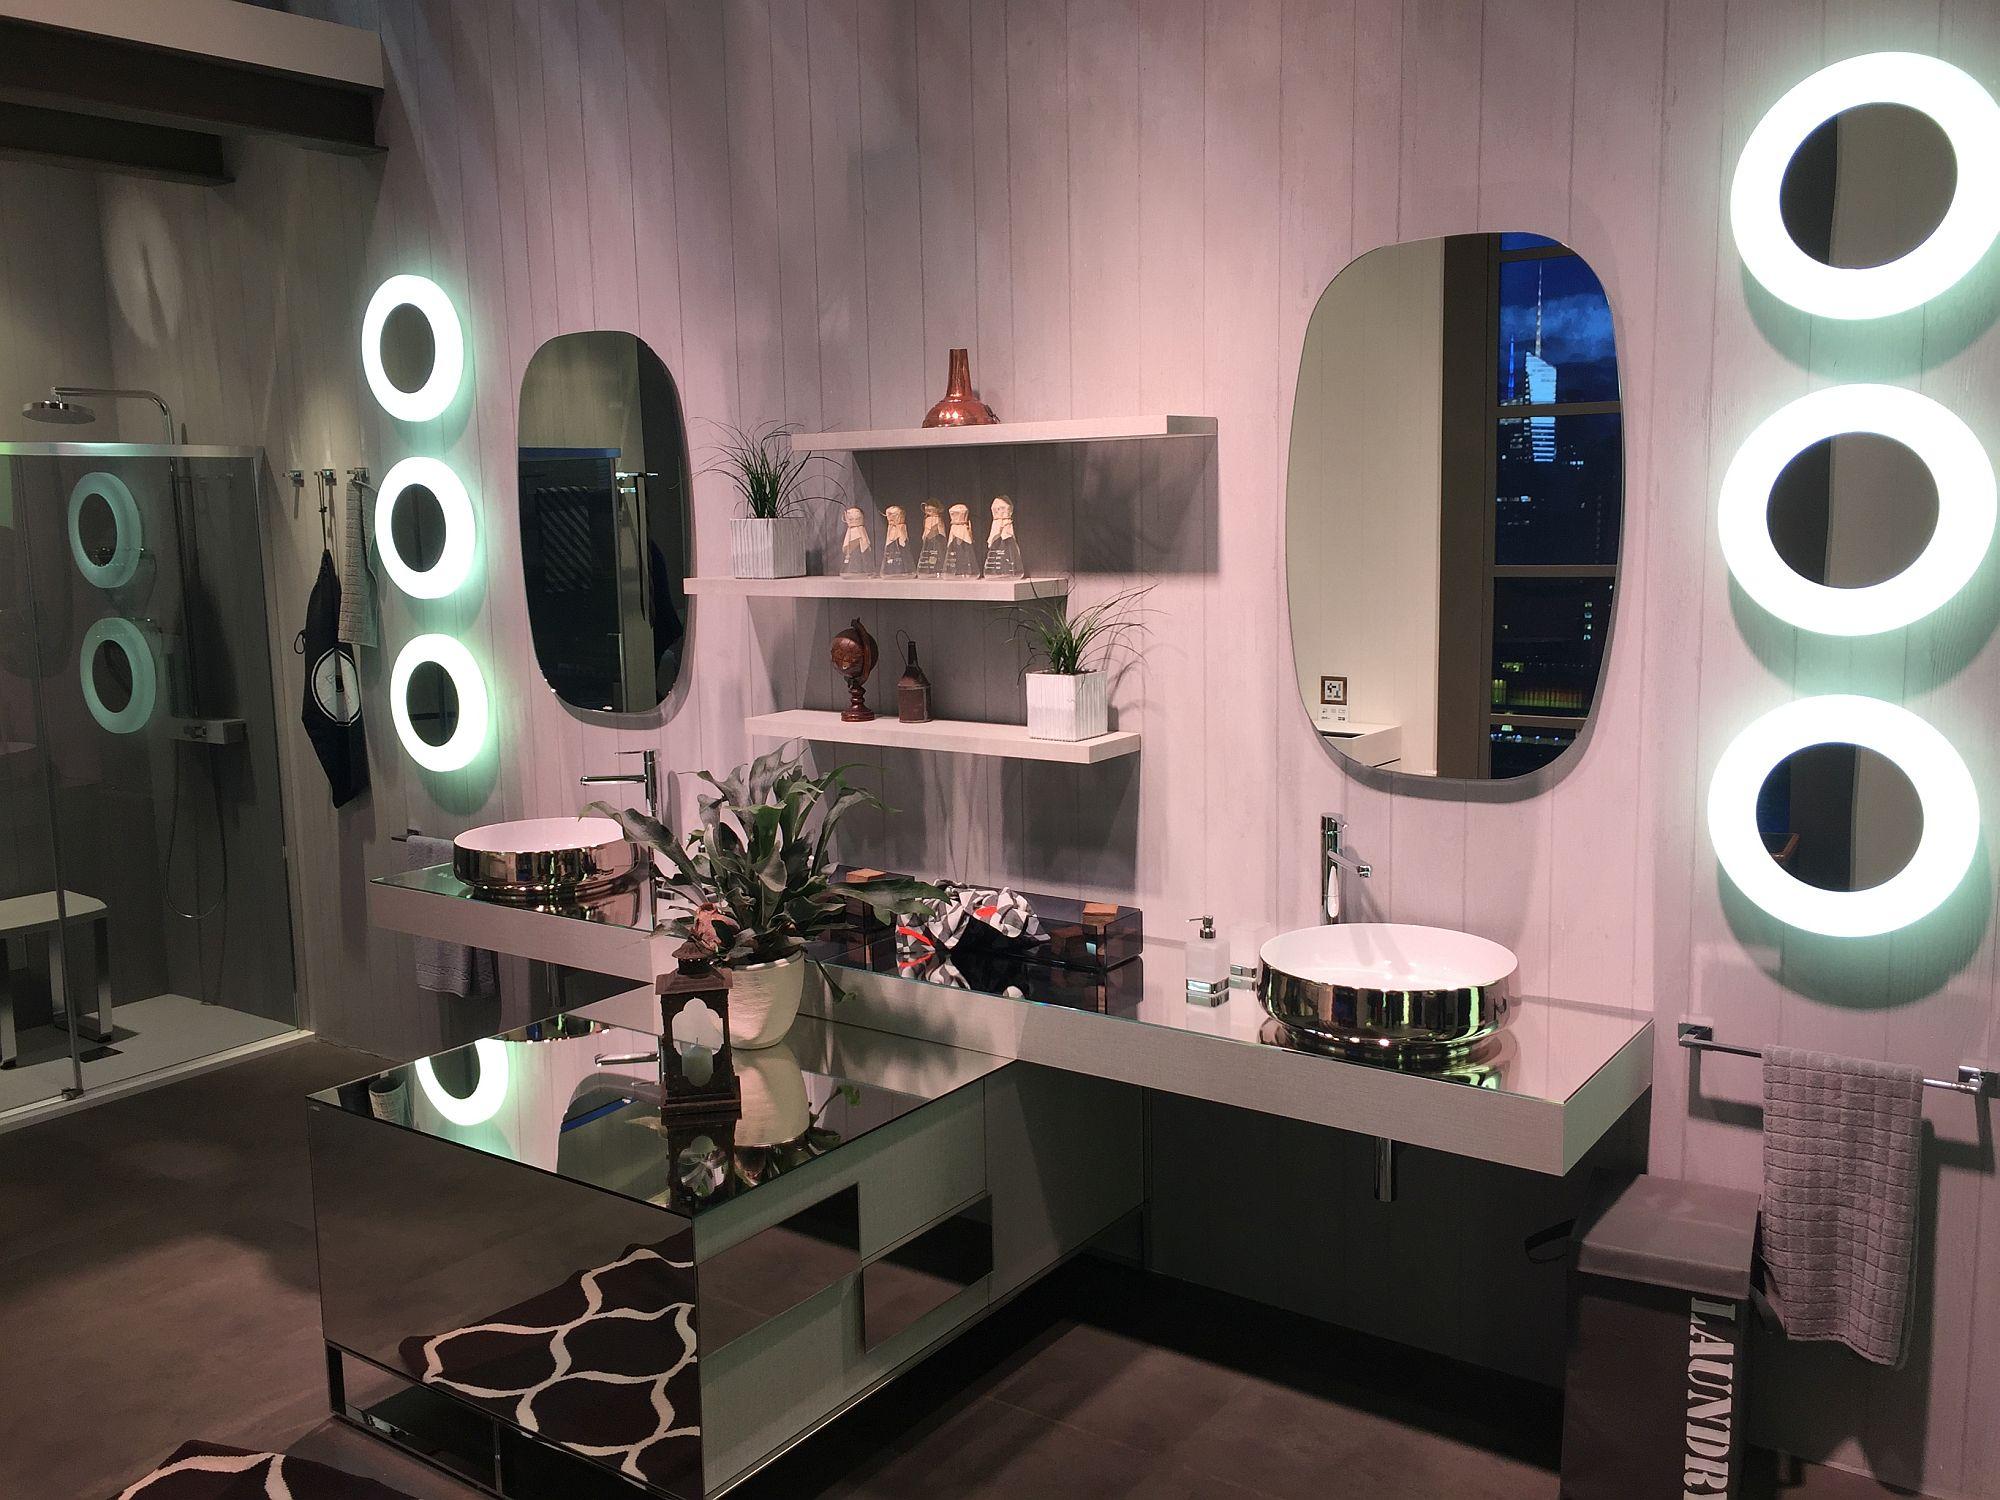 Exquisite-lighting-and-bathroom-mirror-ideas-from-INDA